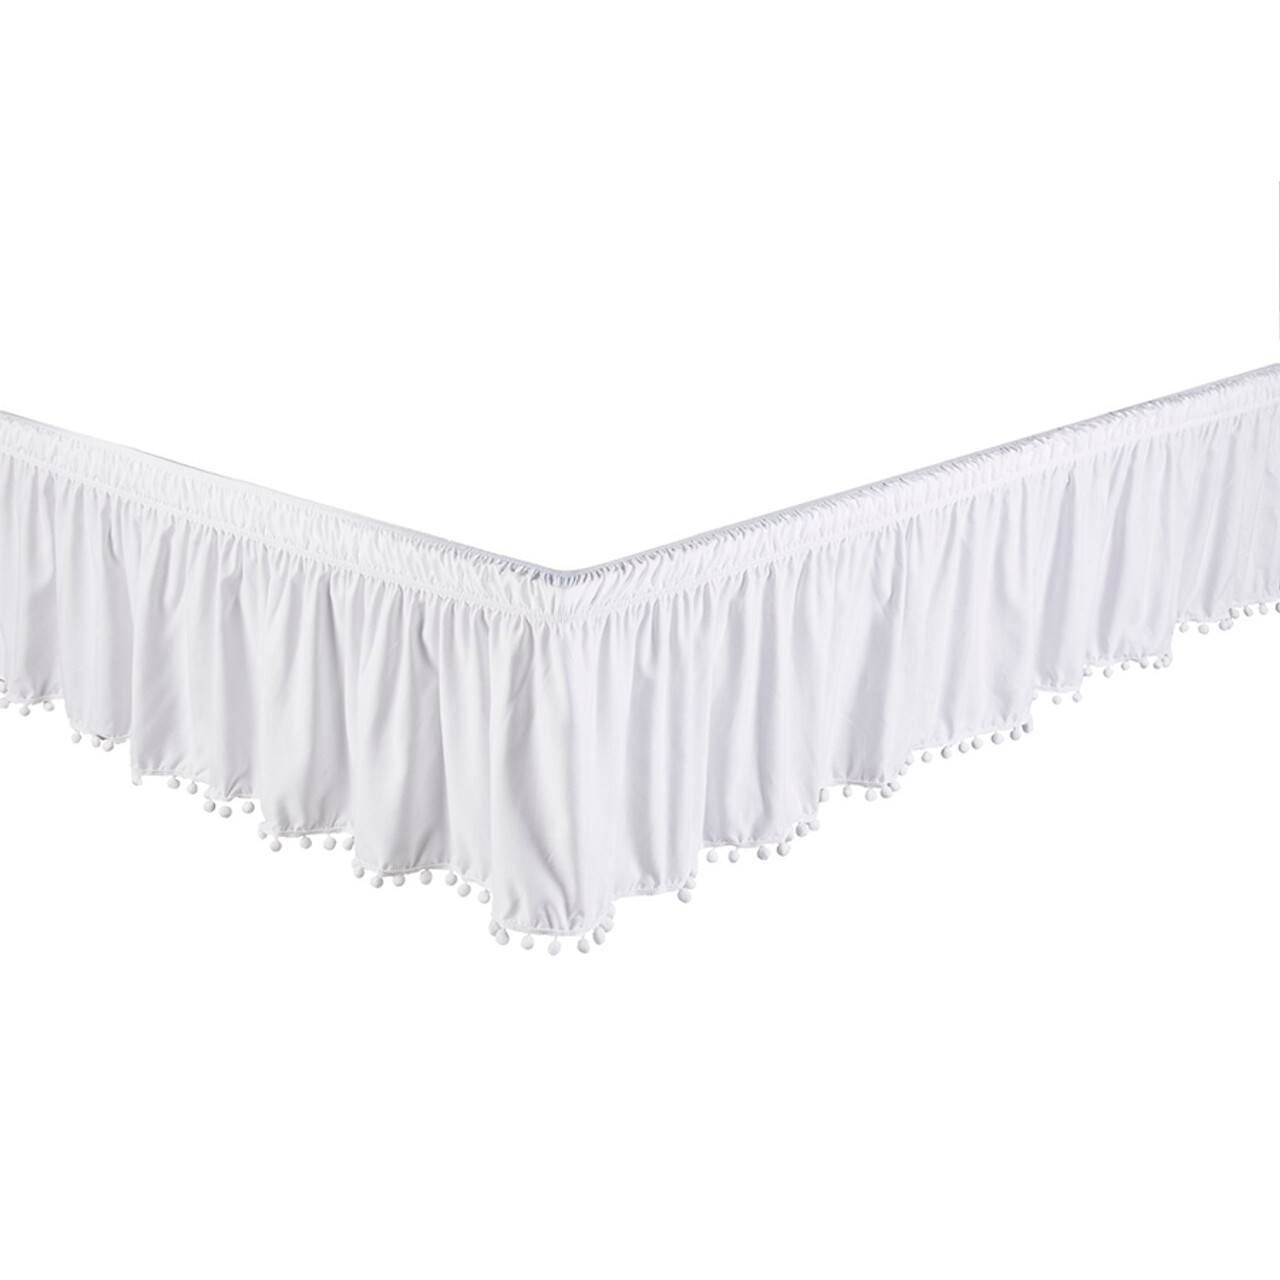 "White Bed Skirt Dust Ruffle with Pom-Pom Fringe 100% Brushed Microfiber with 14"" Drop in USA, California, New York, New York City, Los Angeles, San Francisco, Pennsylvania, Washington DC, Virginia, Maryland"